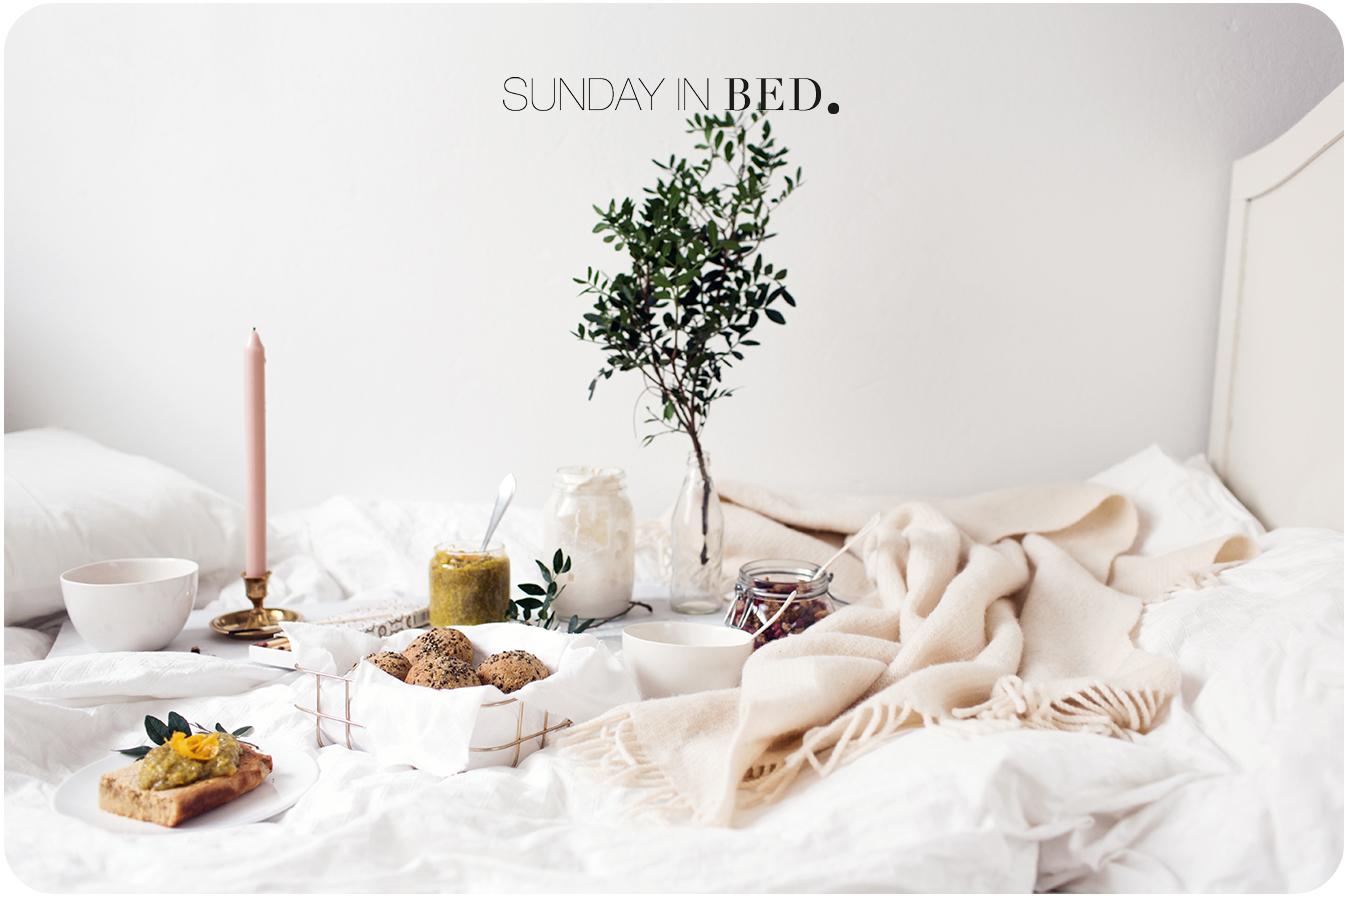 sunday in bed archives feelinggoods. Black Bedroom Furniture Sets. Home Design Ideas